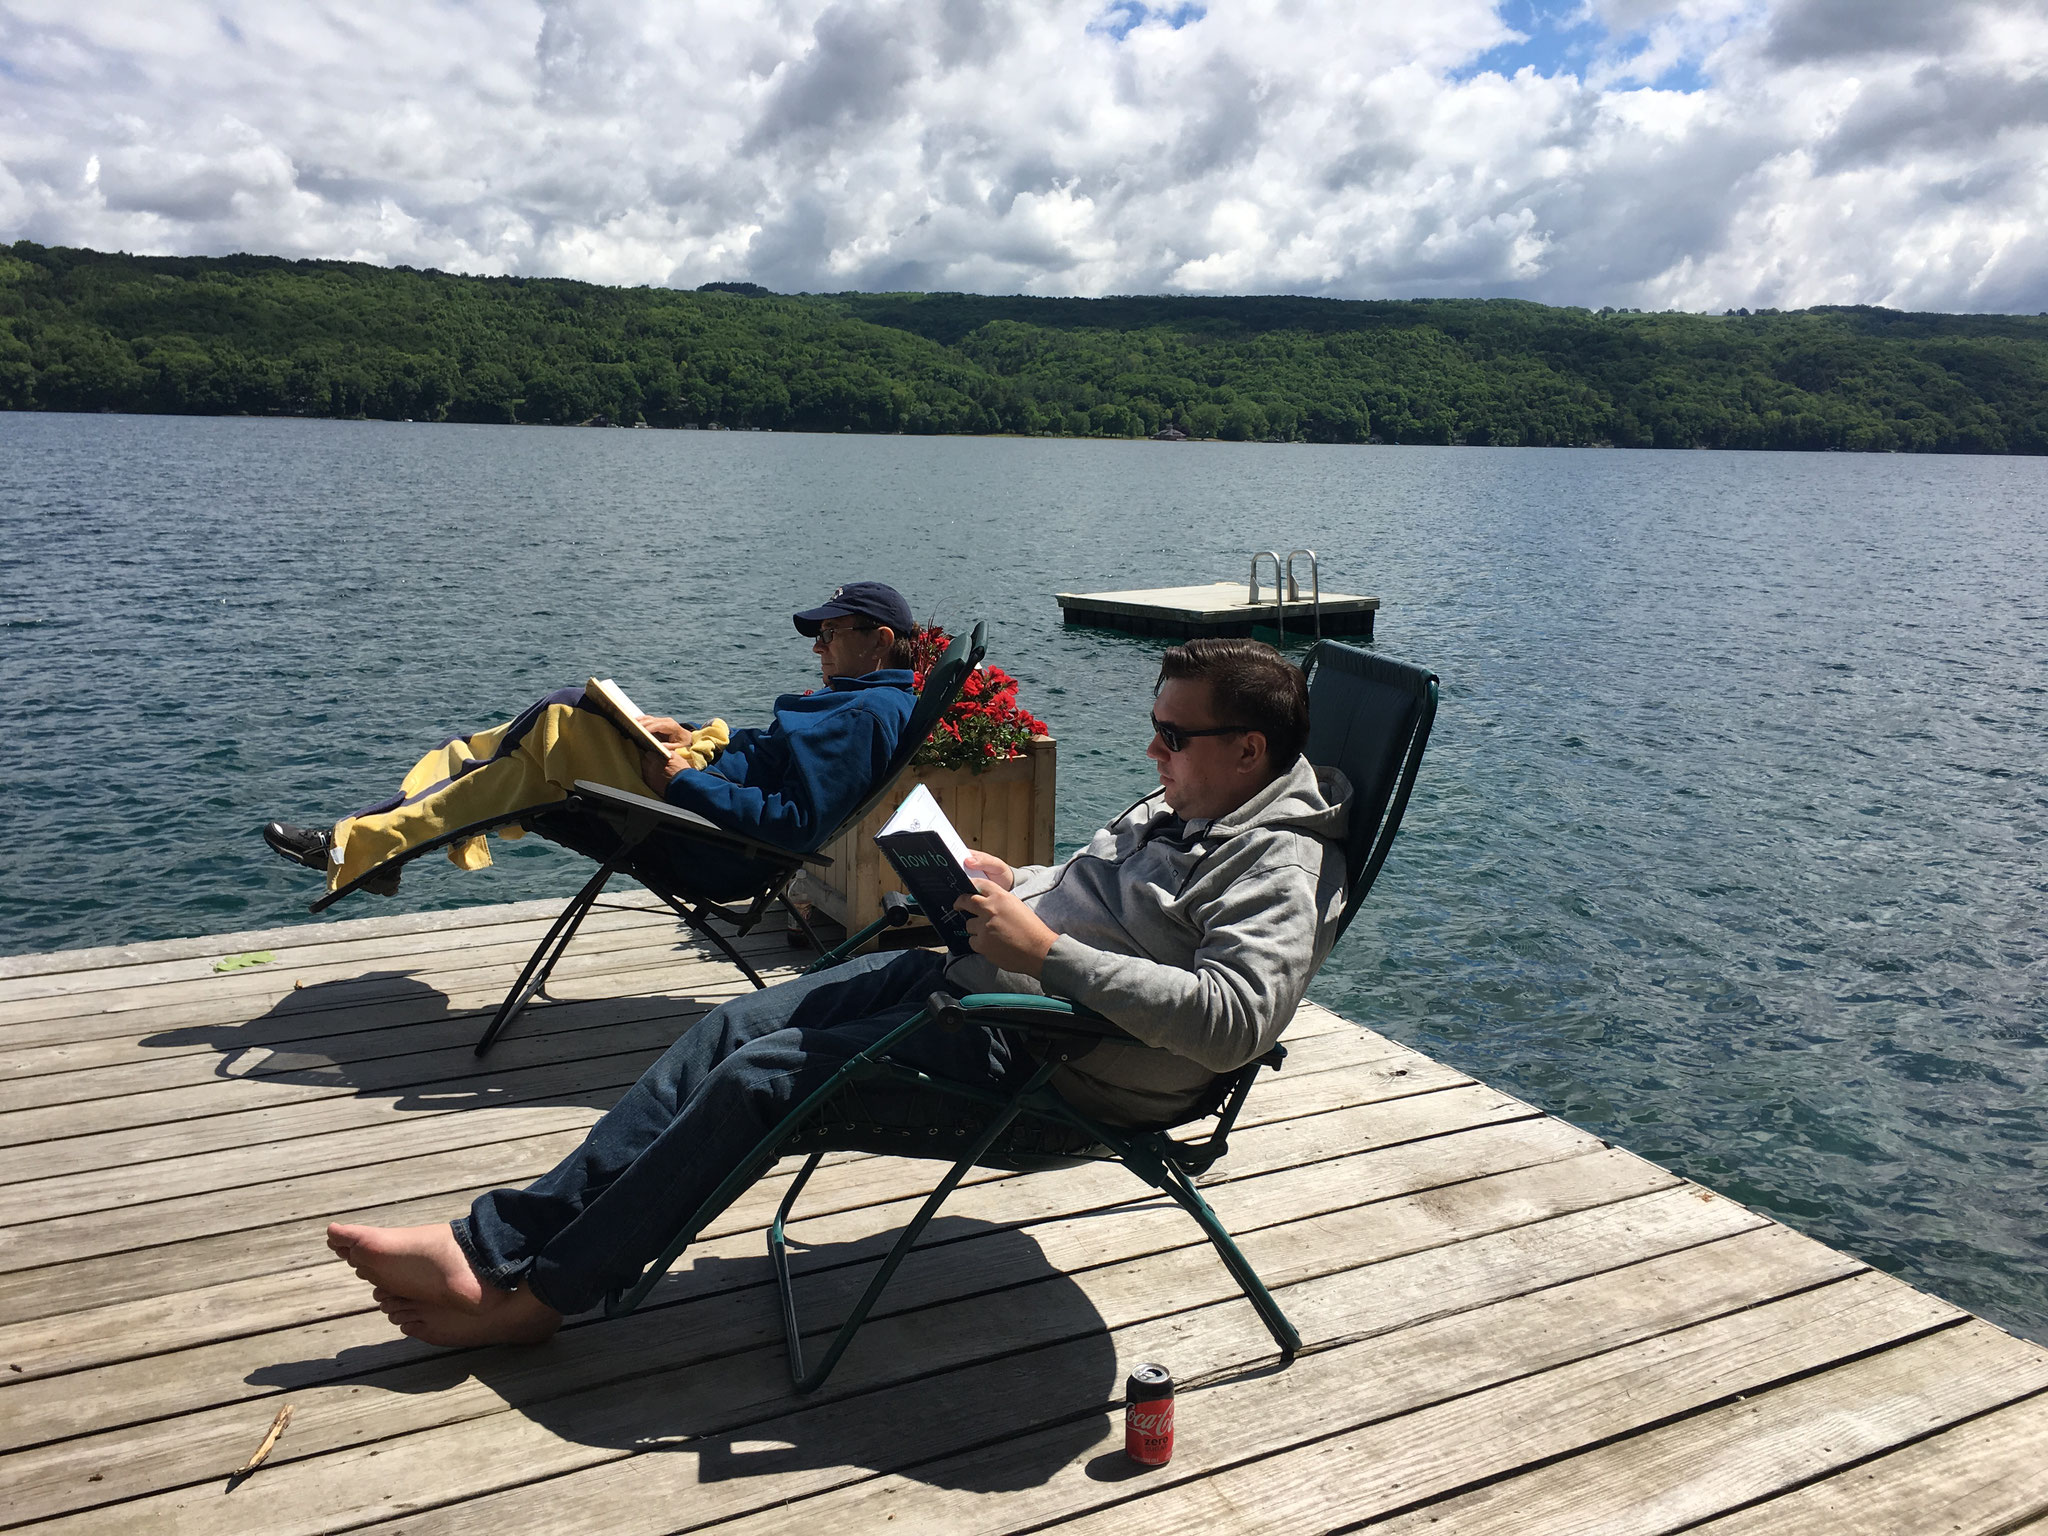 John & Greg relaxing on Skaneateles Lake, 7-2020